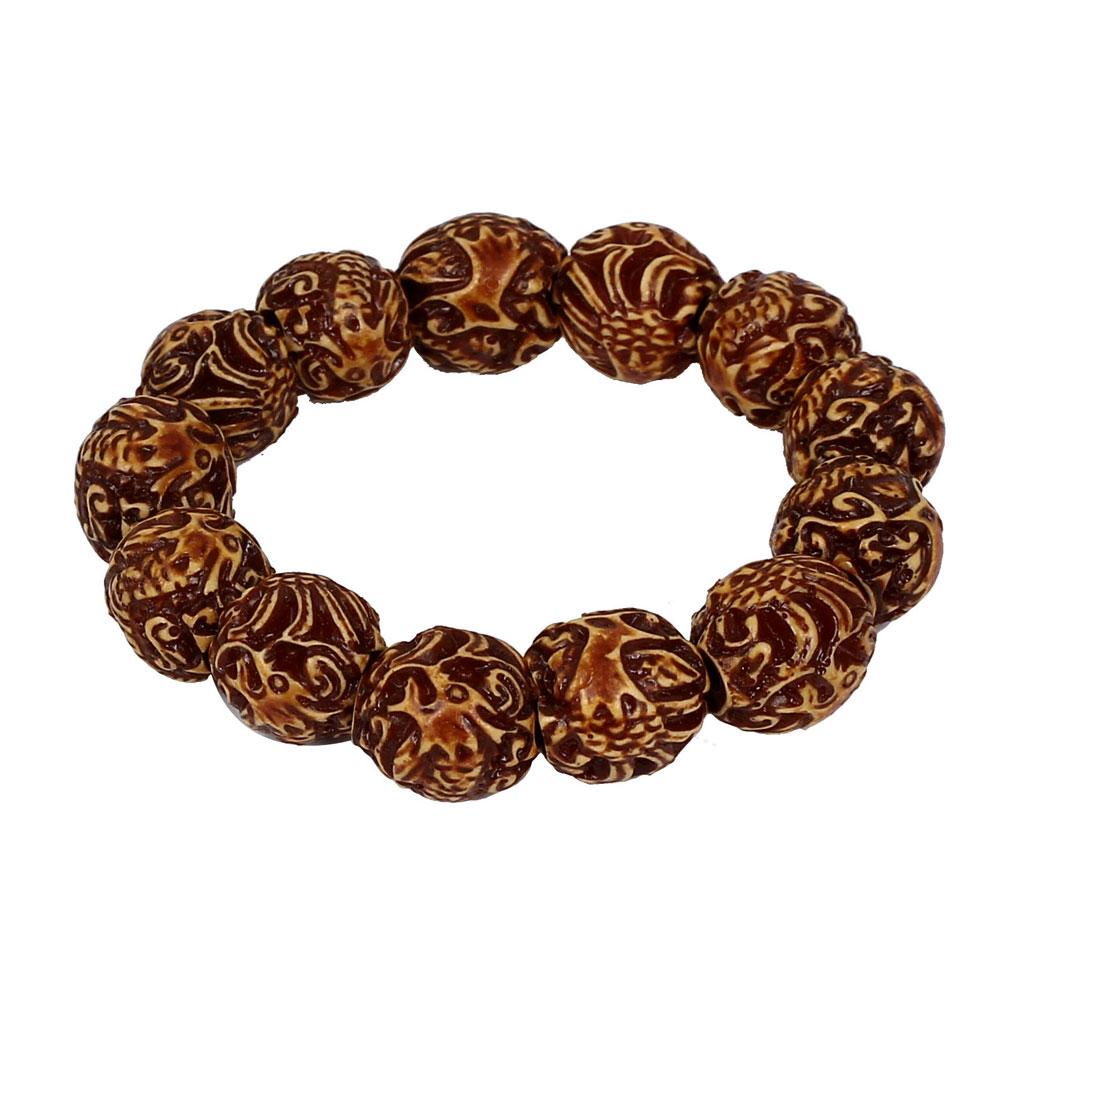 Men Women Yak Bone Dragon Phoenix Carved Bead Stretchy Chain Bangle Bracelet